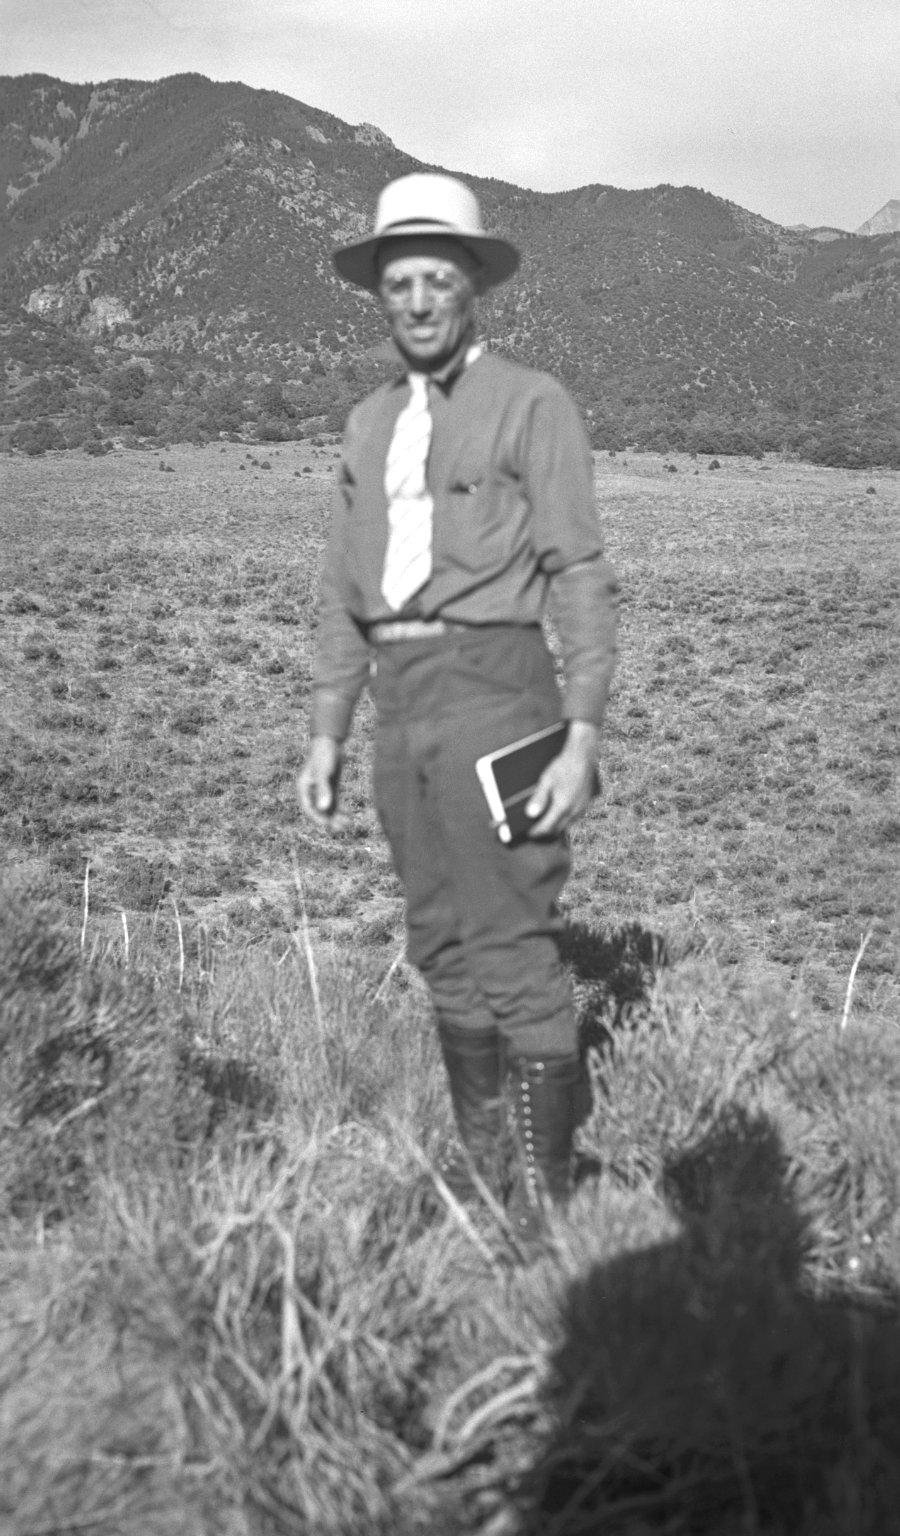 Harvey H. Nininger in the field